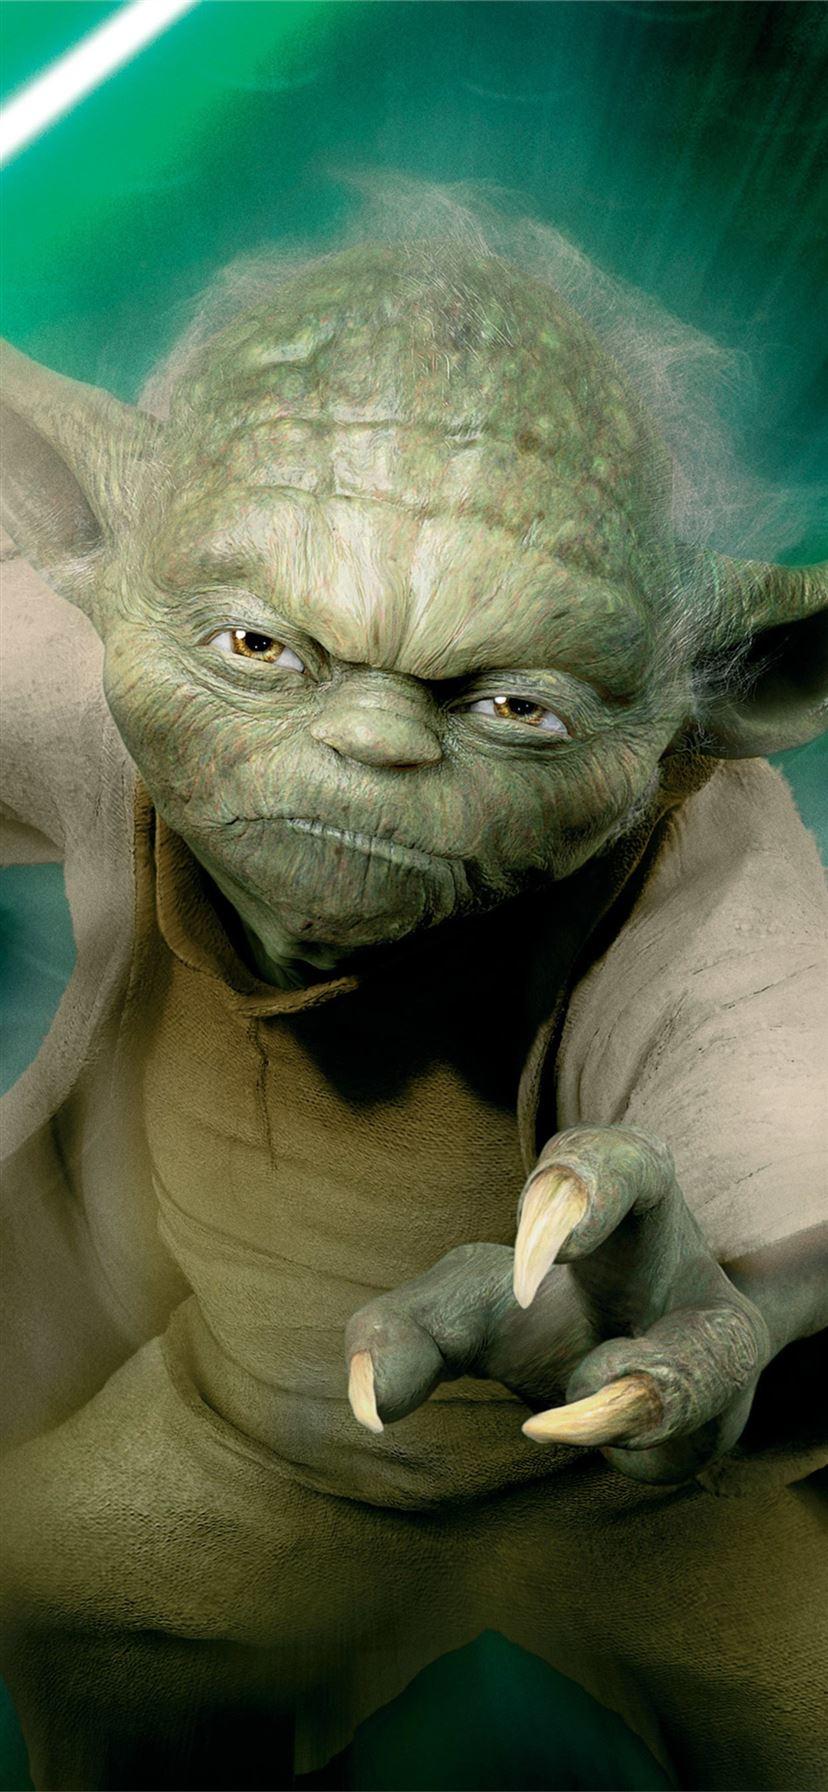 Yoda Star Wars 4k Iphone 11 Wallpapers Free Download